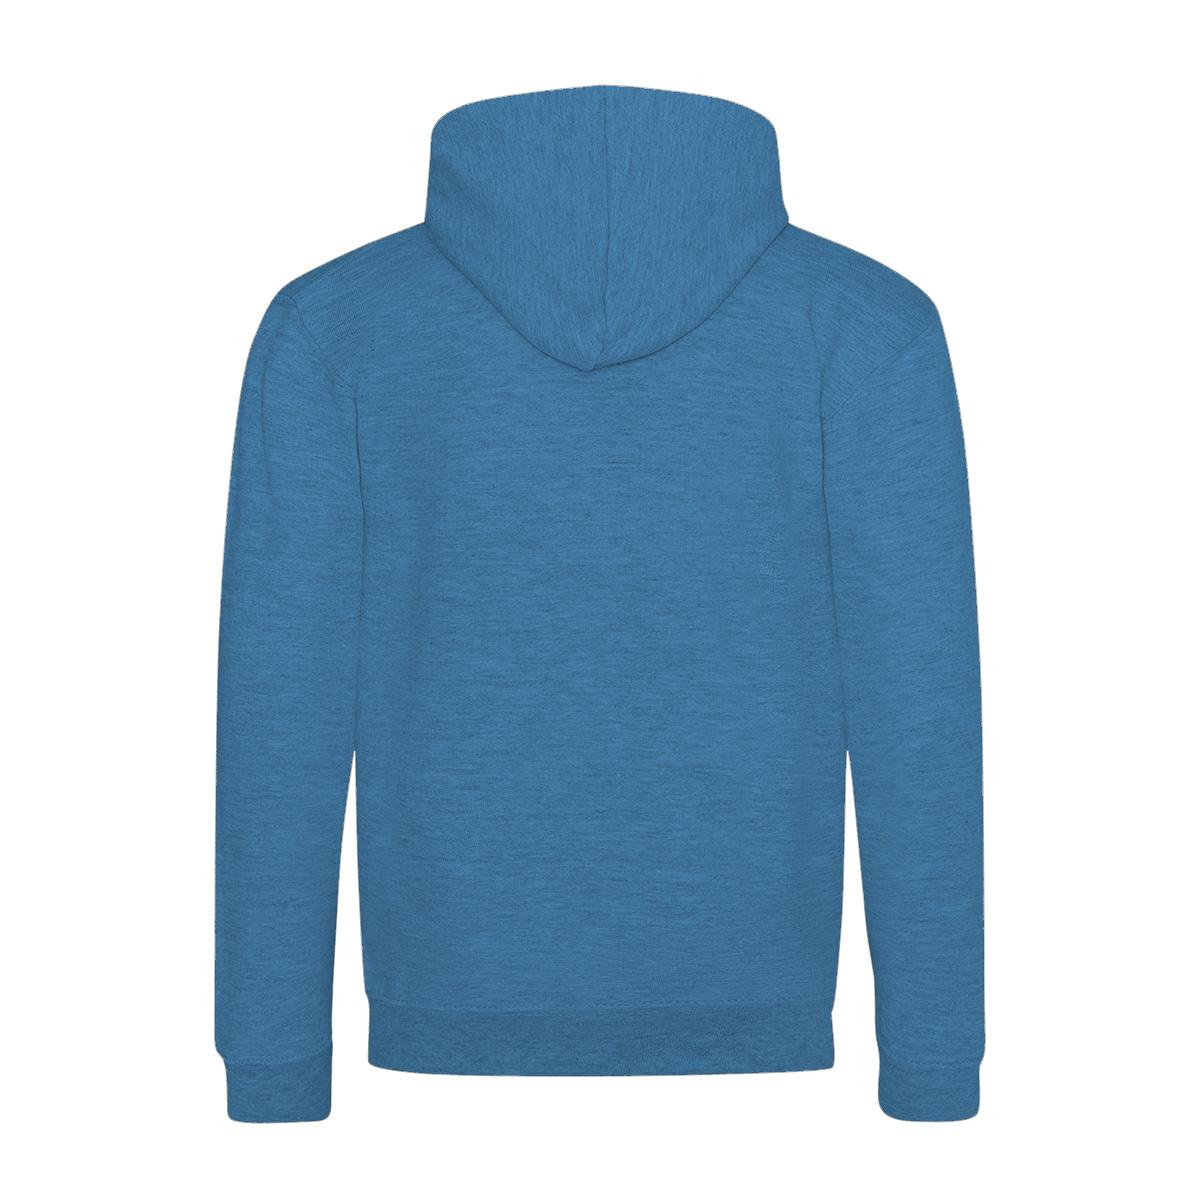 D05_jh53j_blue--0-0--20901e19-db2e-4a29-aaa1-35a000c984f3